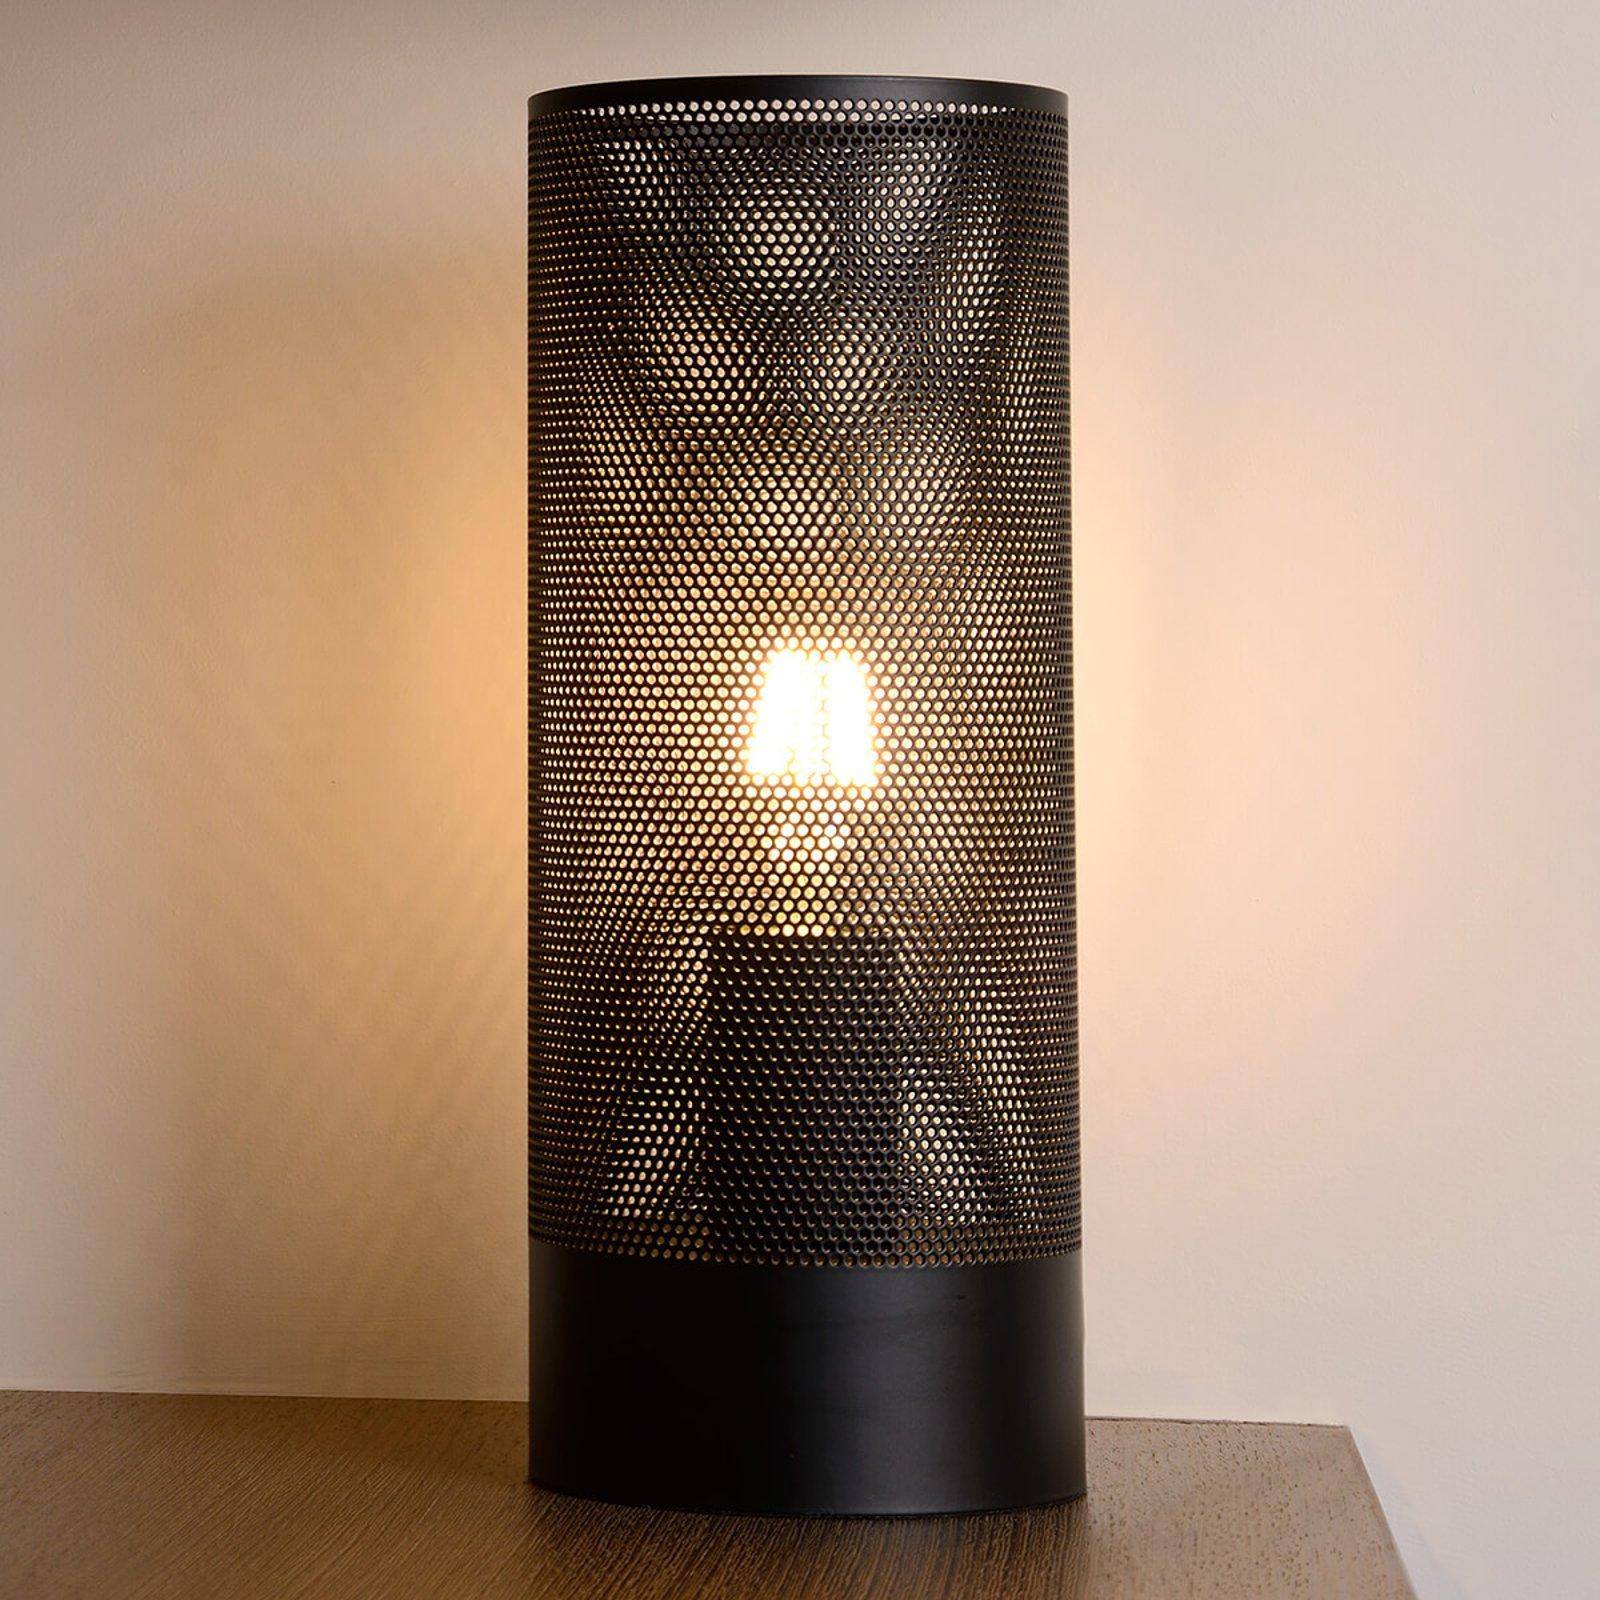 Rettformet bordlampe Beli i svart